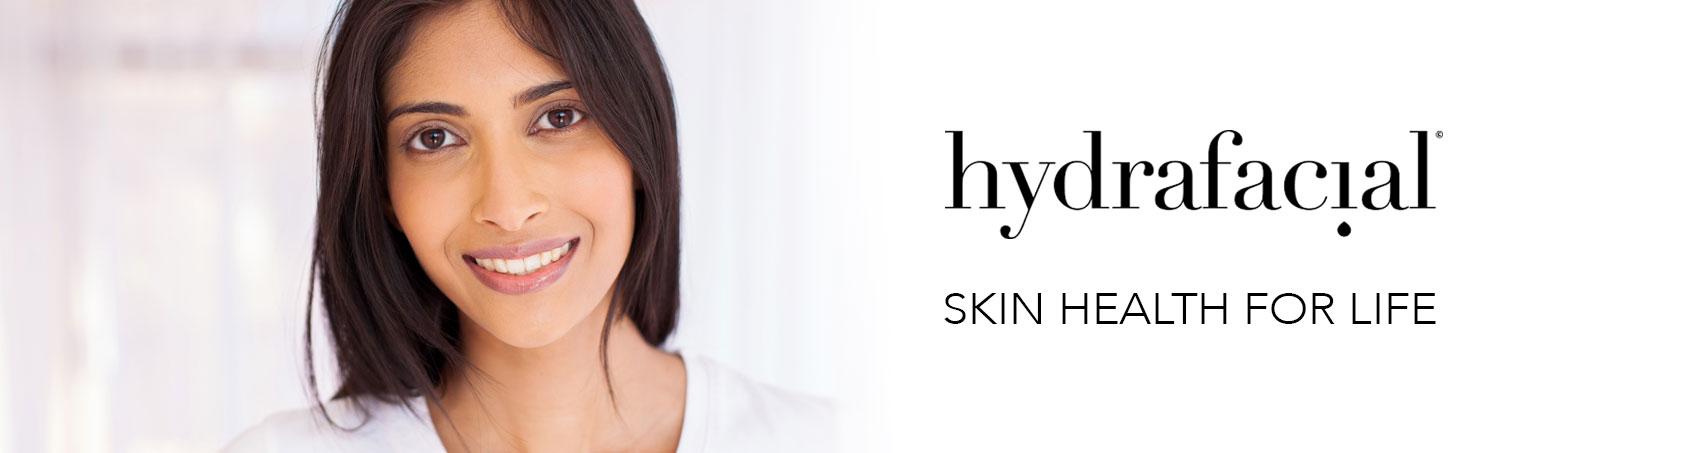 Hydrafacial Skin Health for Life